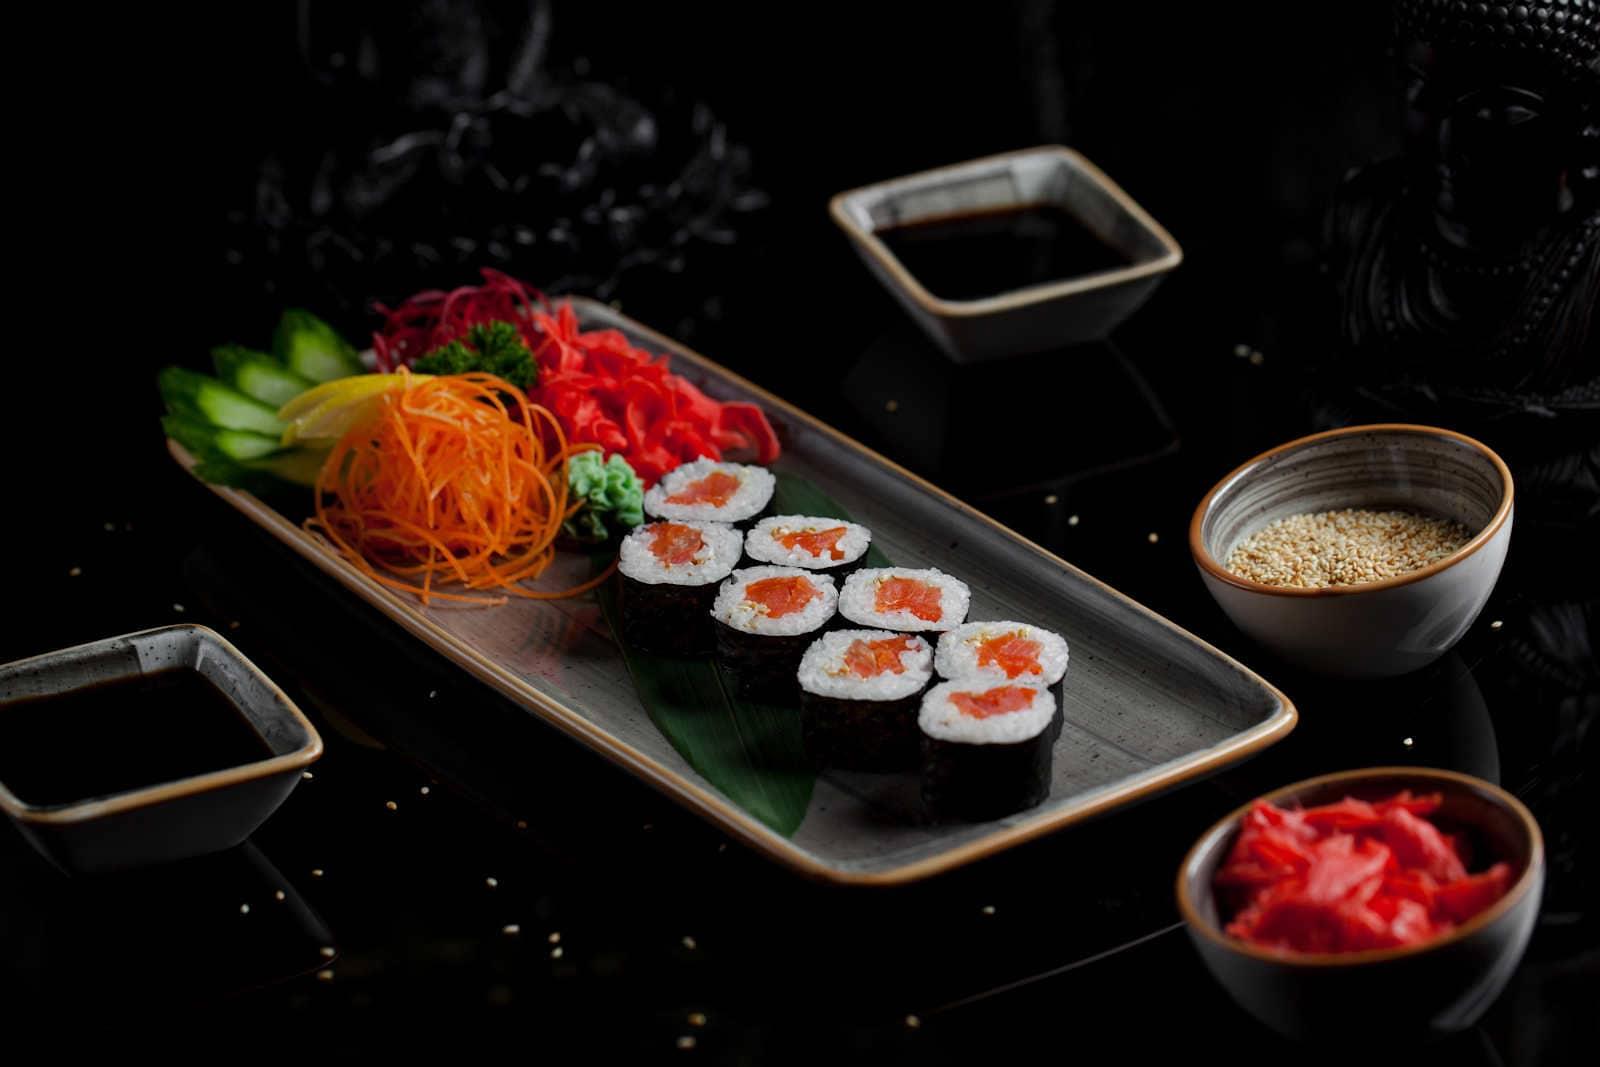 Kobe Sushi & Hibachi Steak House of Edmond